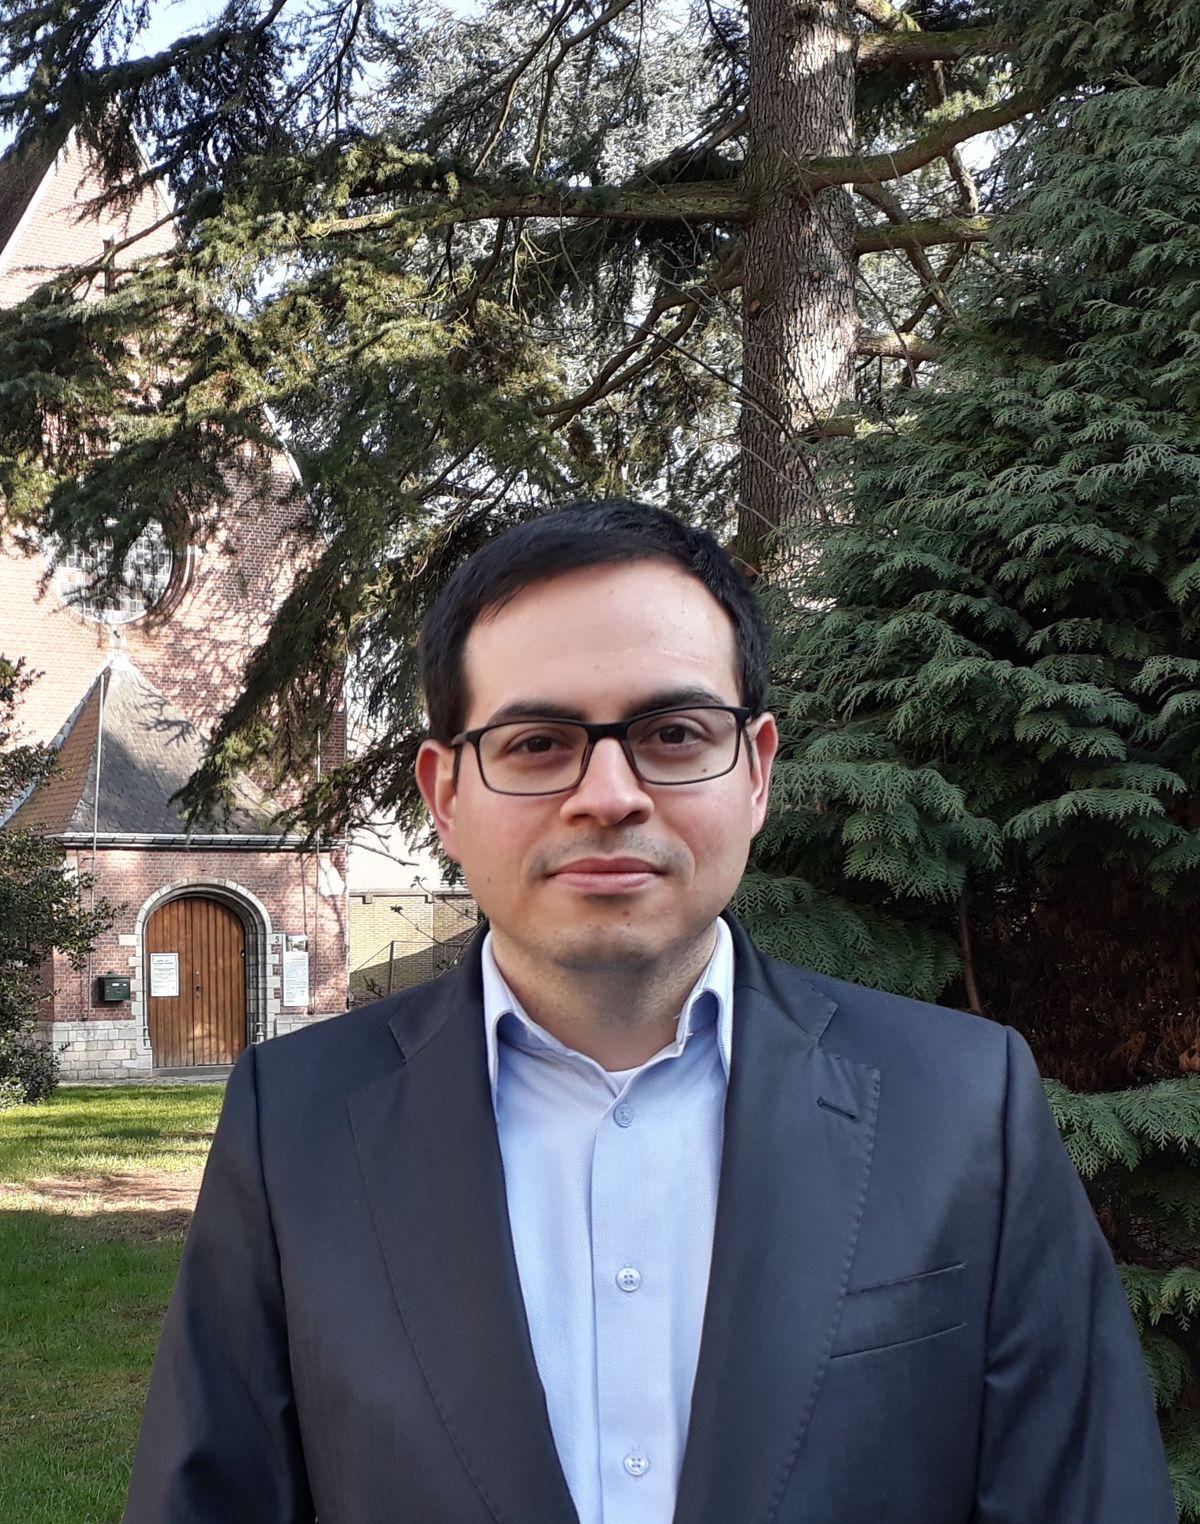 Sergio Calderón Ardila